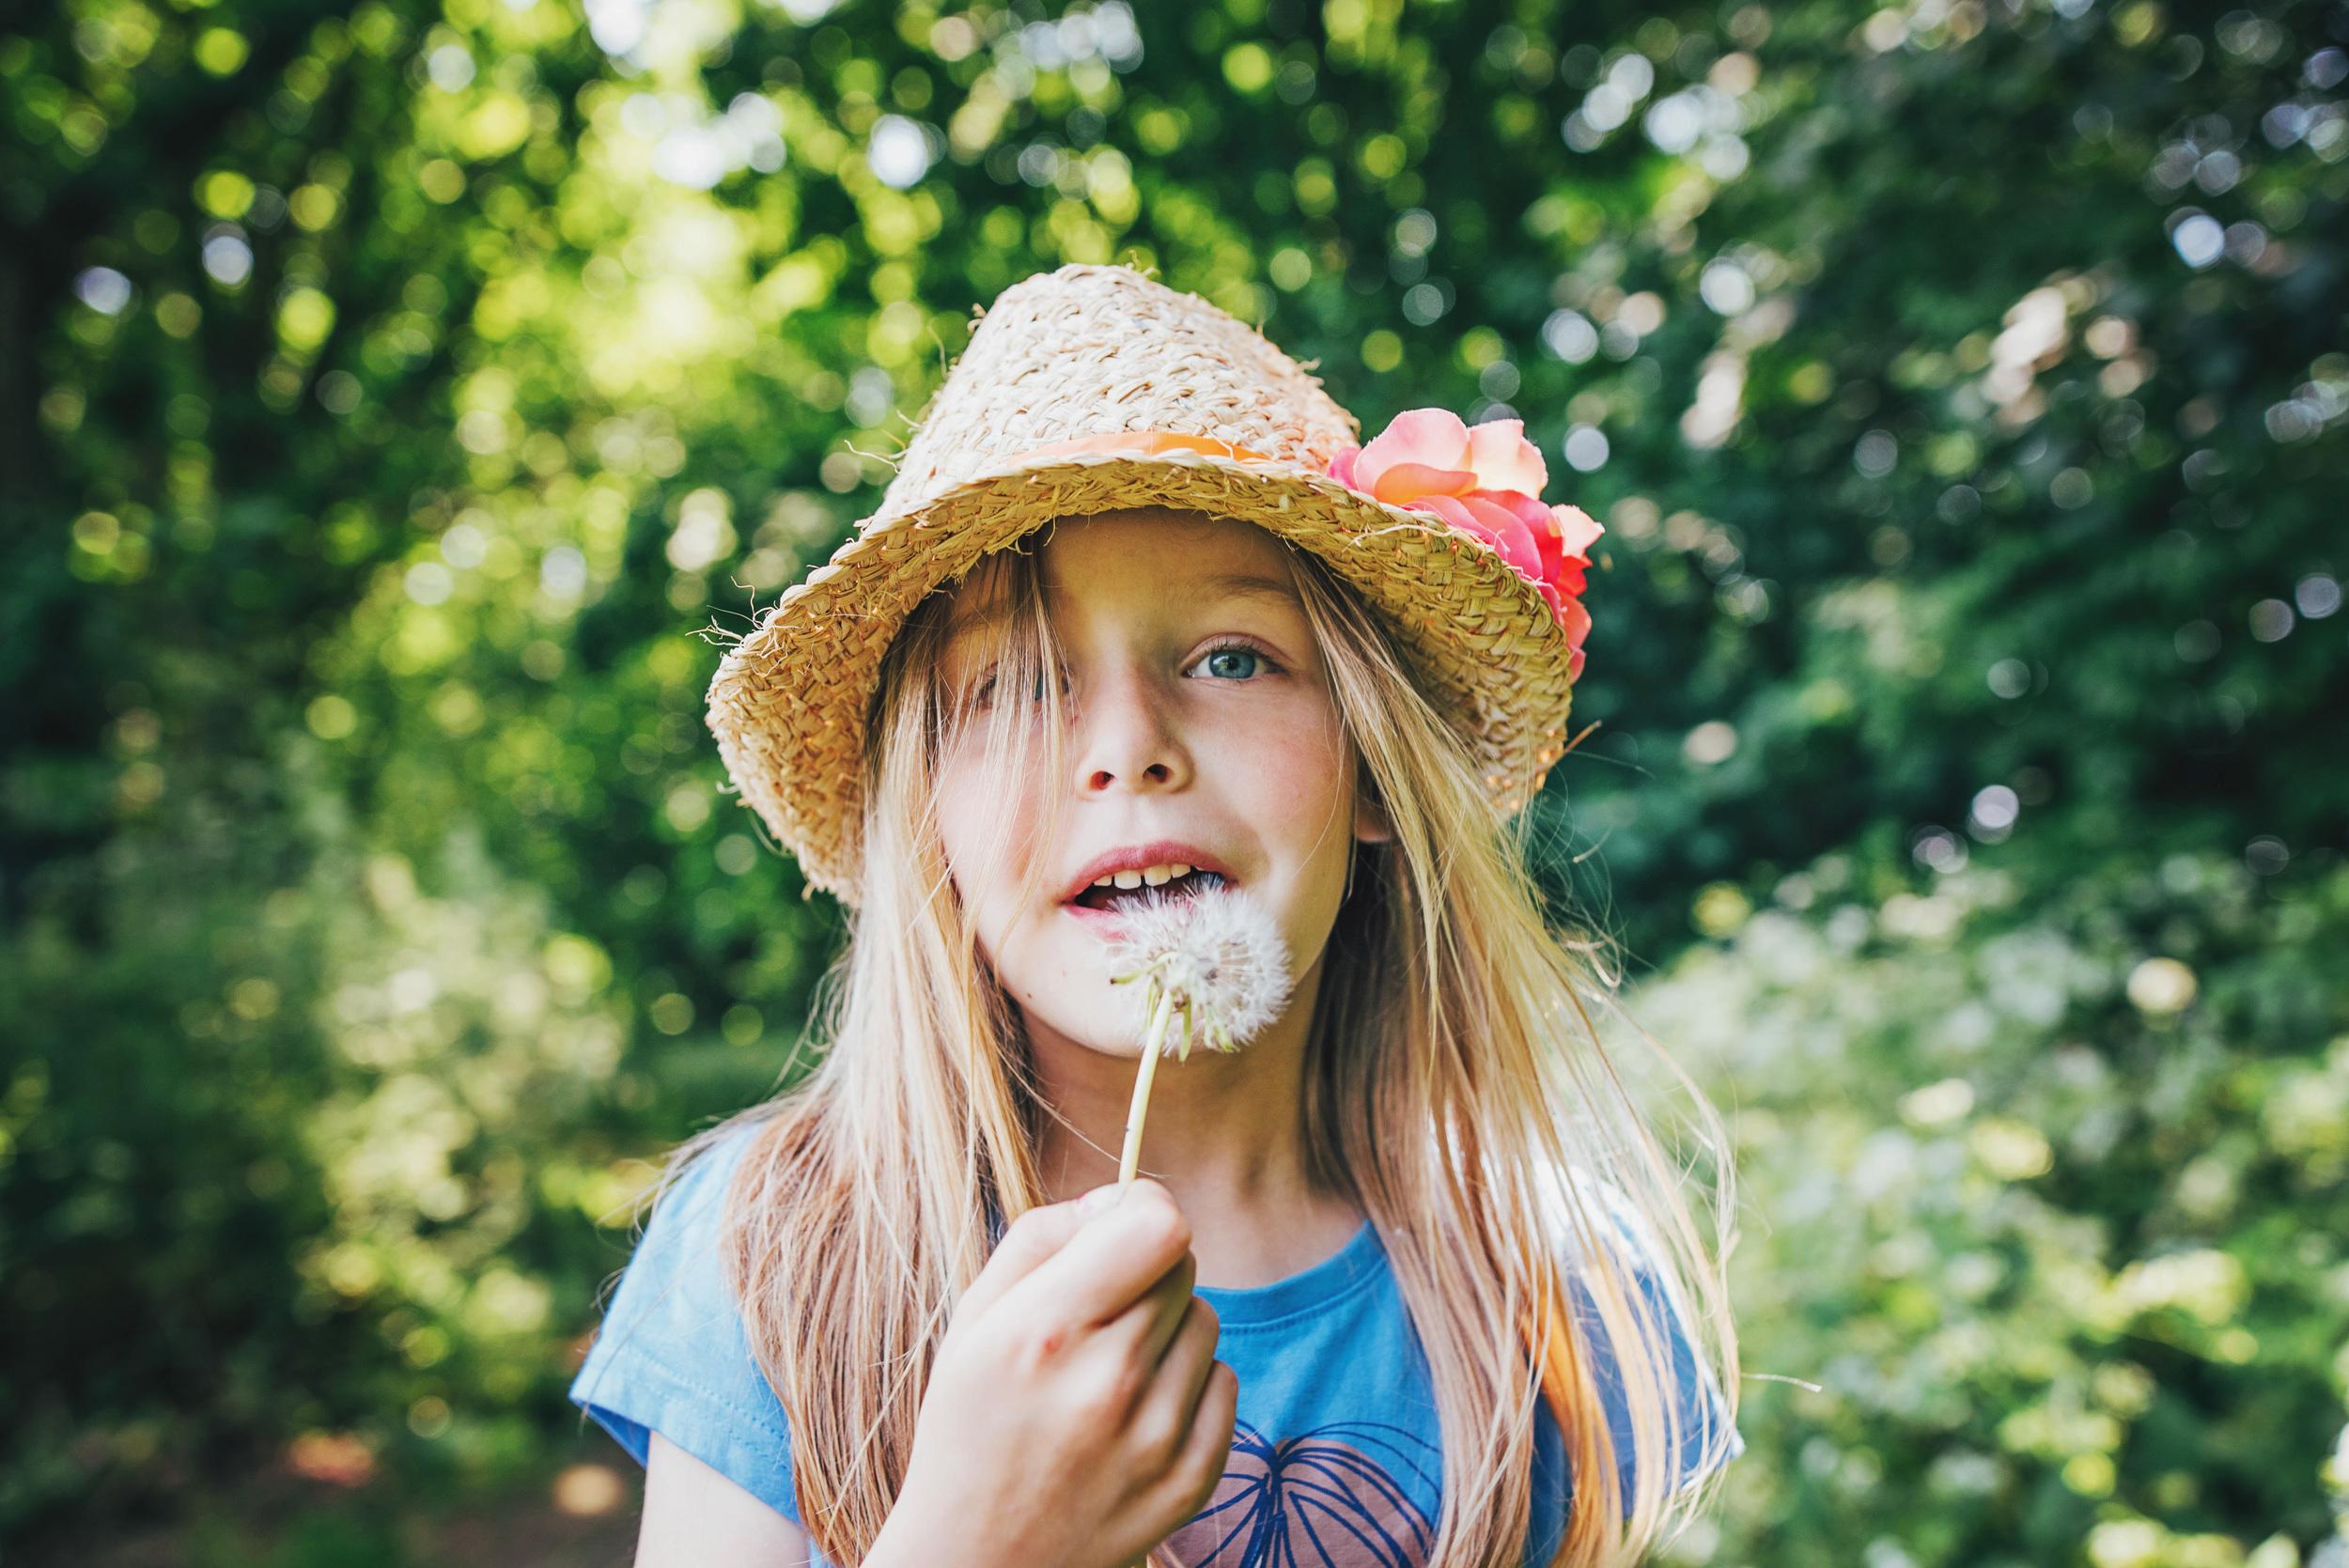 Little girl blows dandelion clock Essex UK Documentary Portrait and Lifestyle Photographer